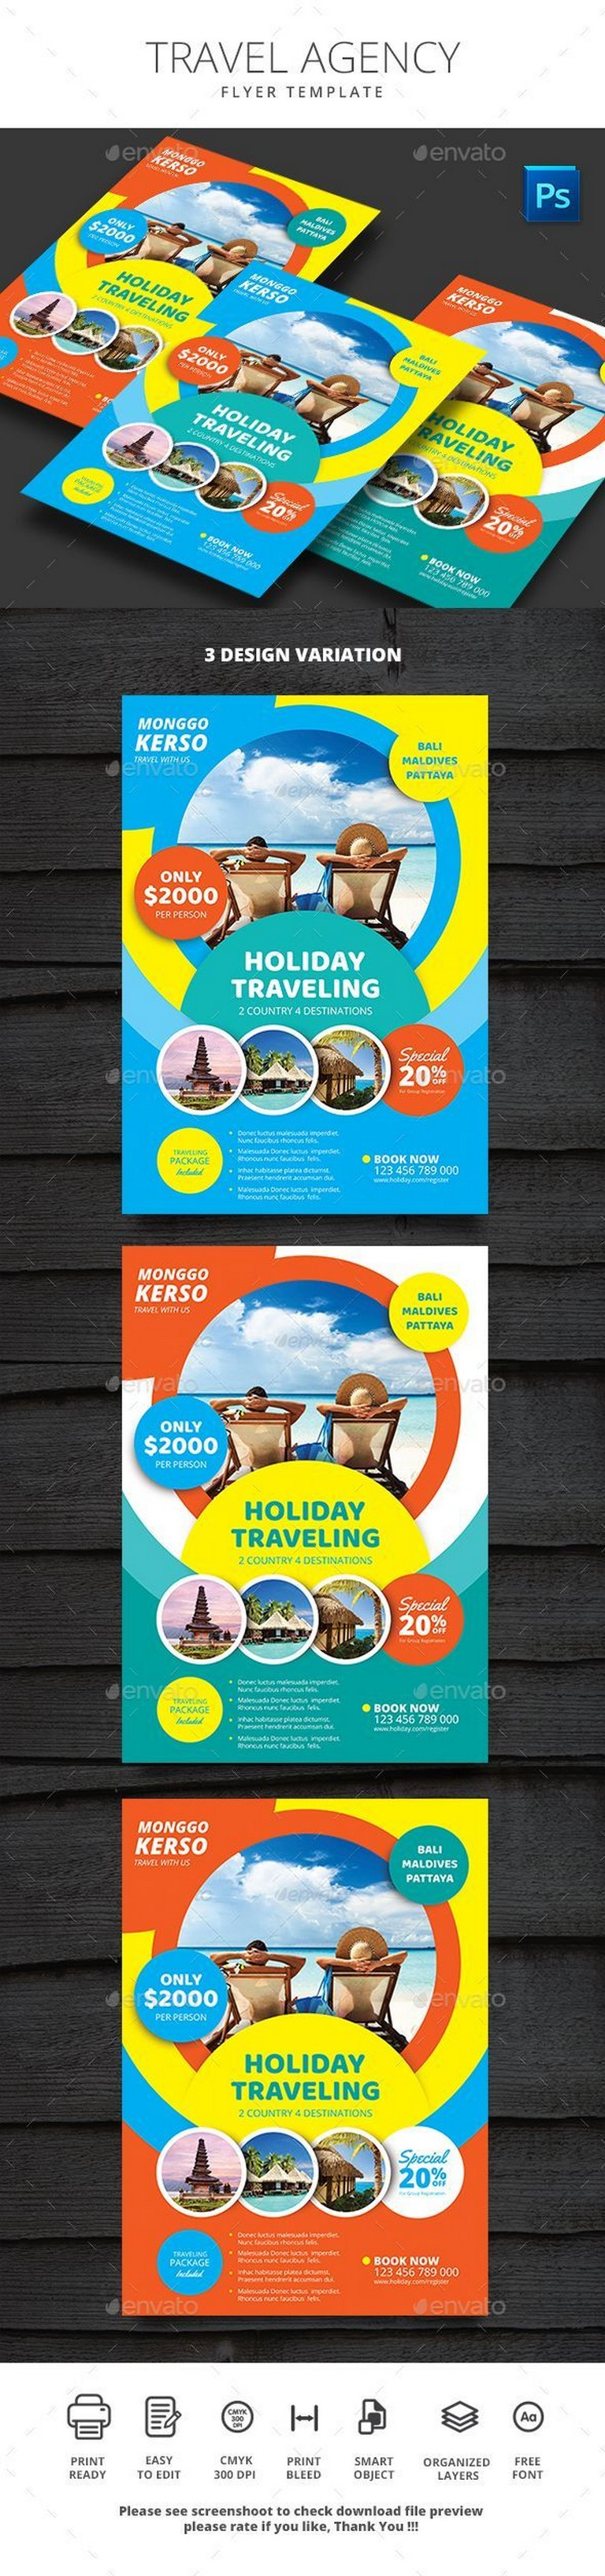 Best Corporate Travel Agencies